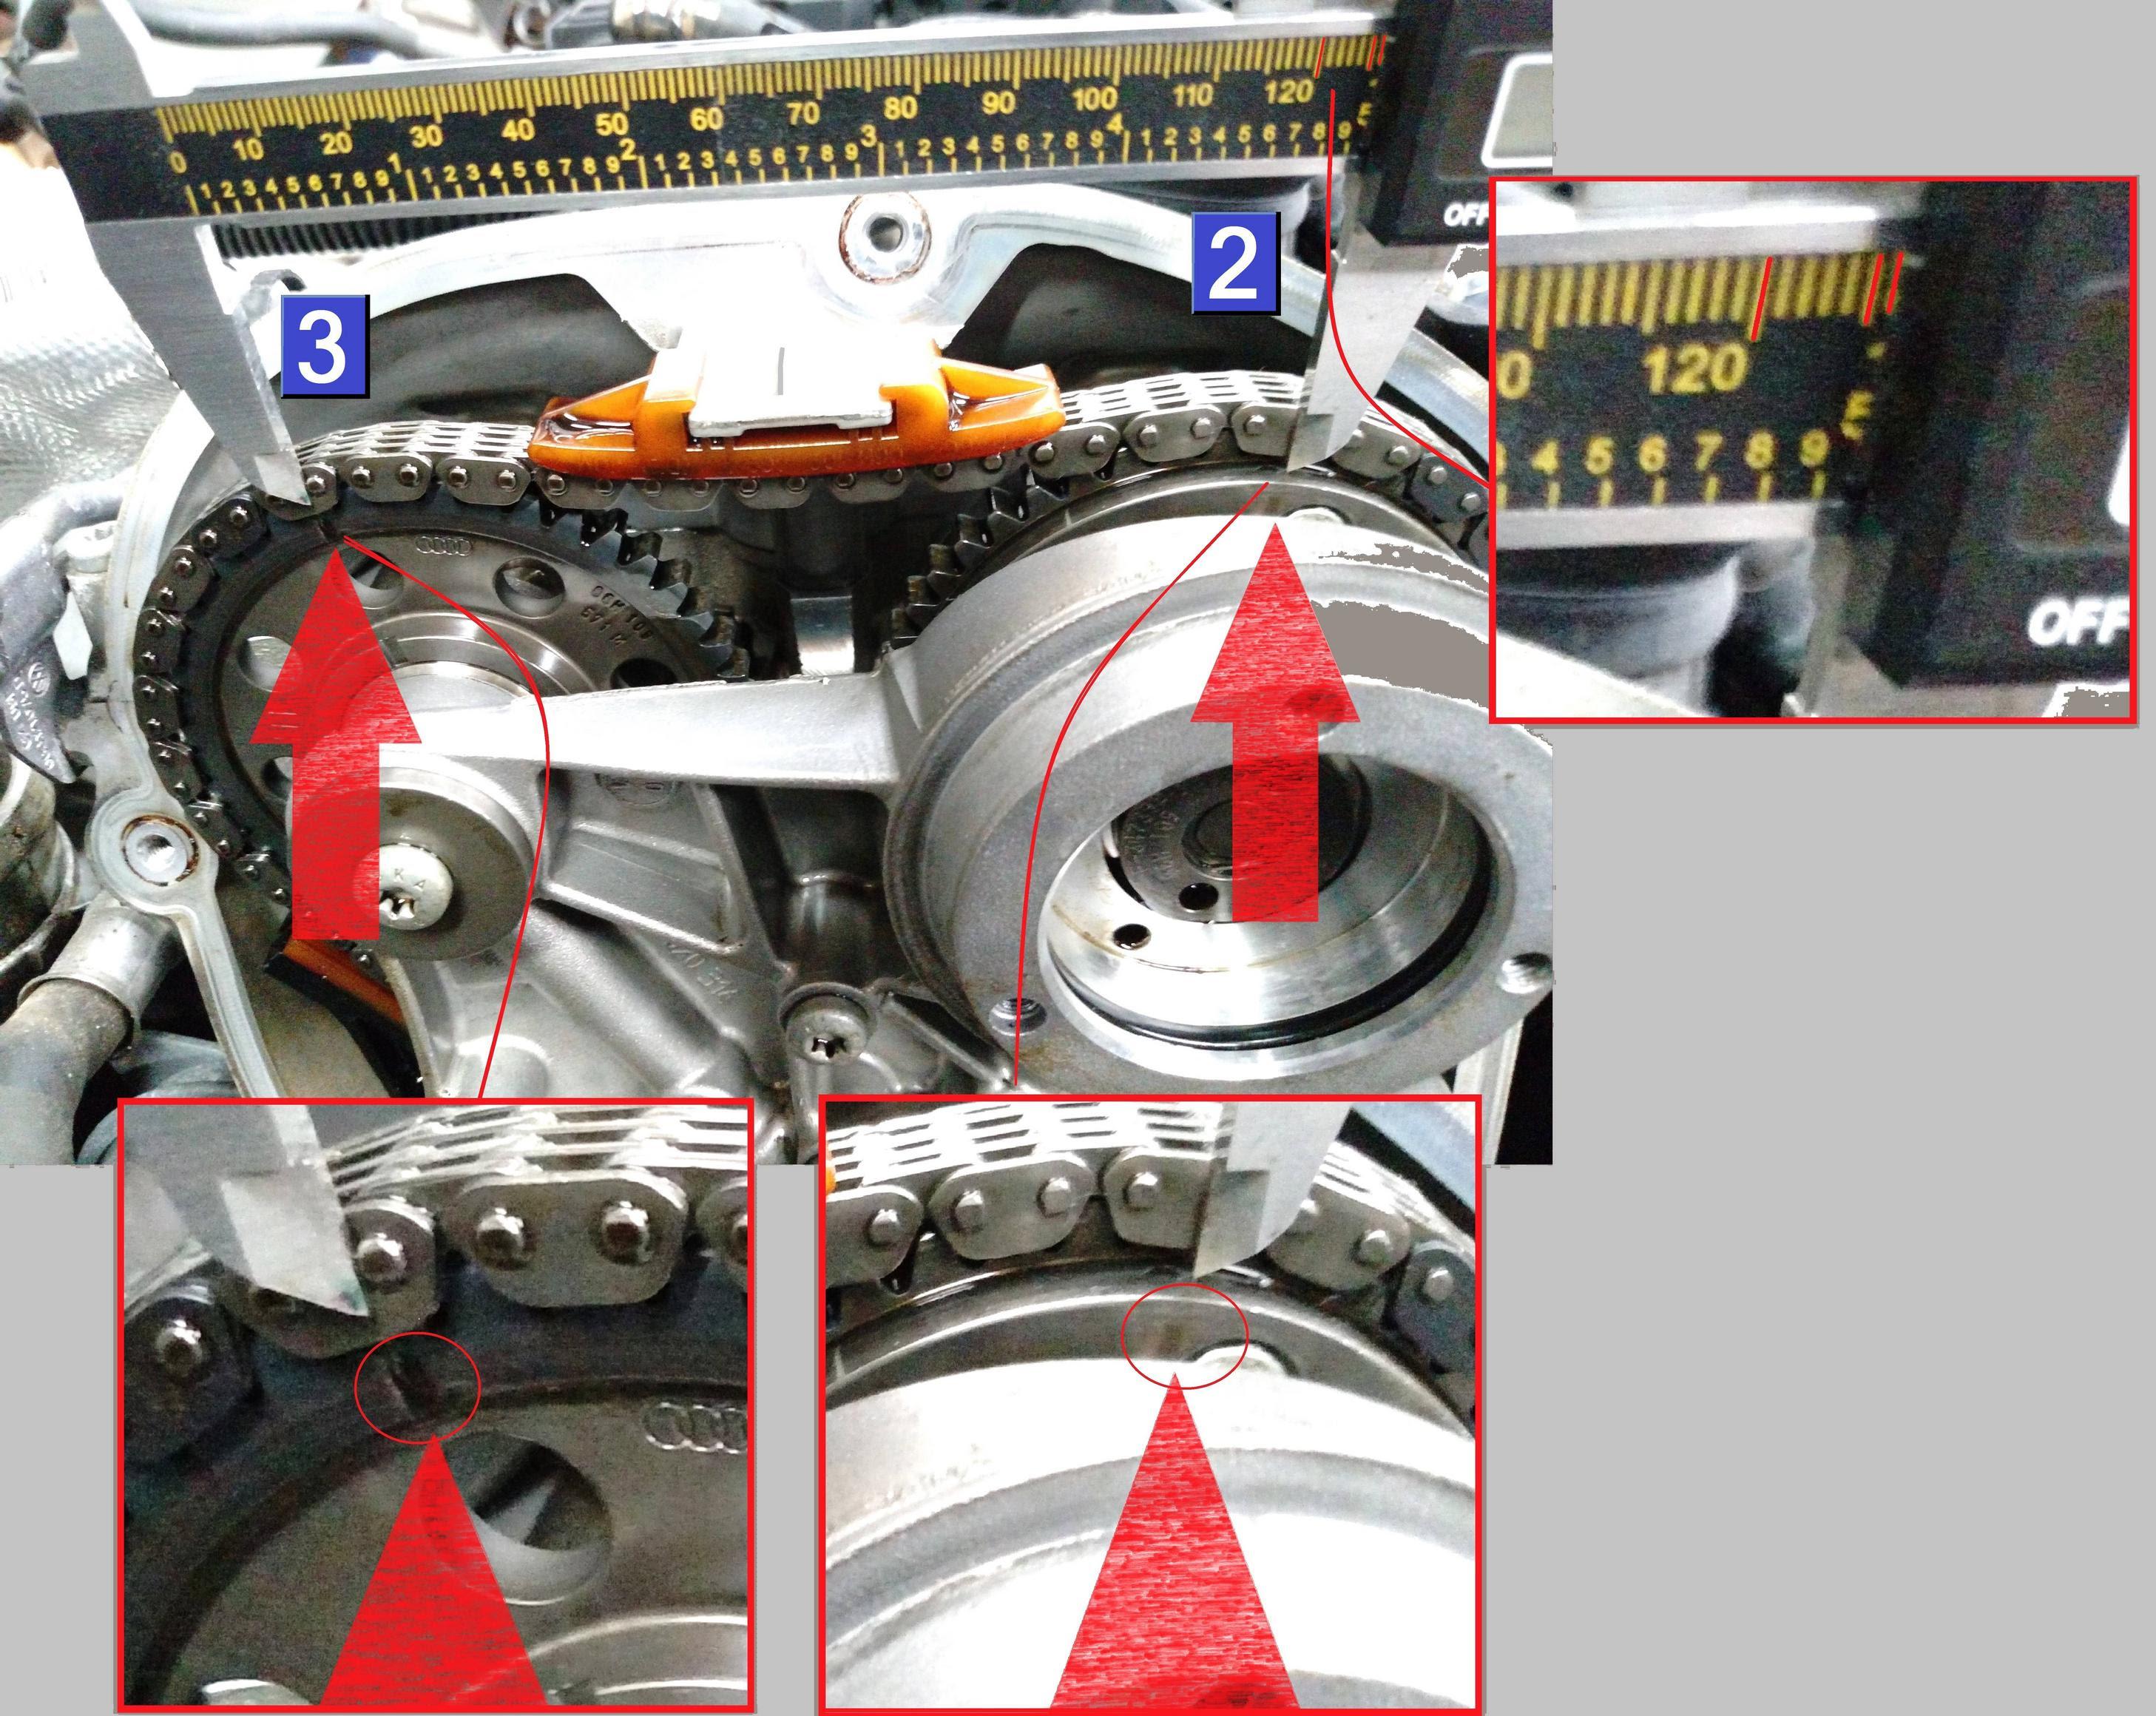 download seat leon fuse box layout image 8